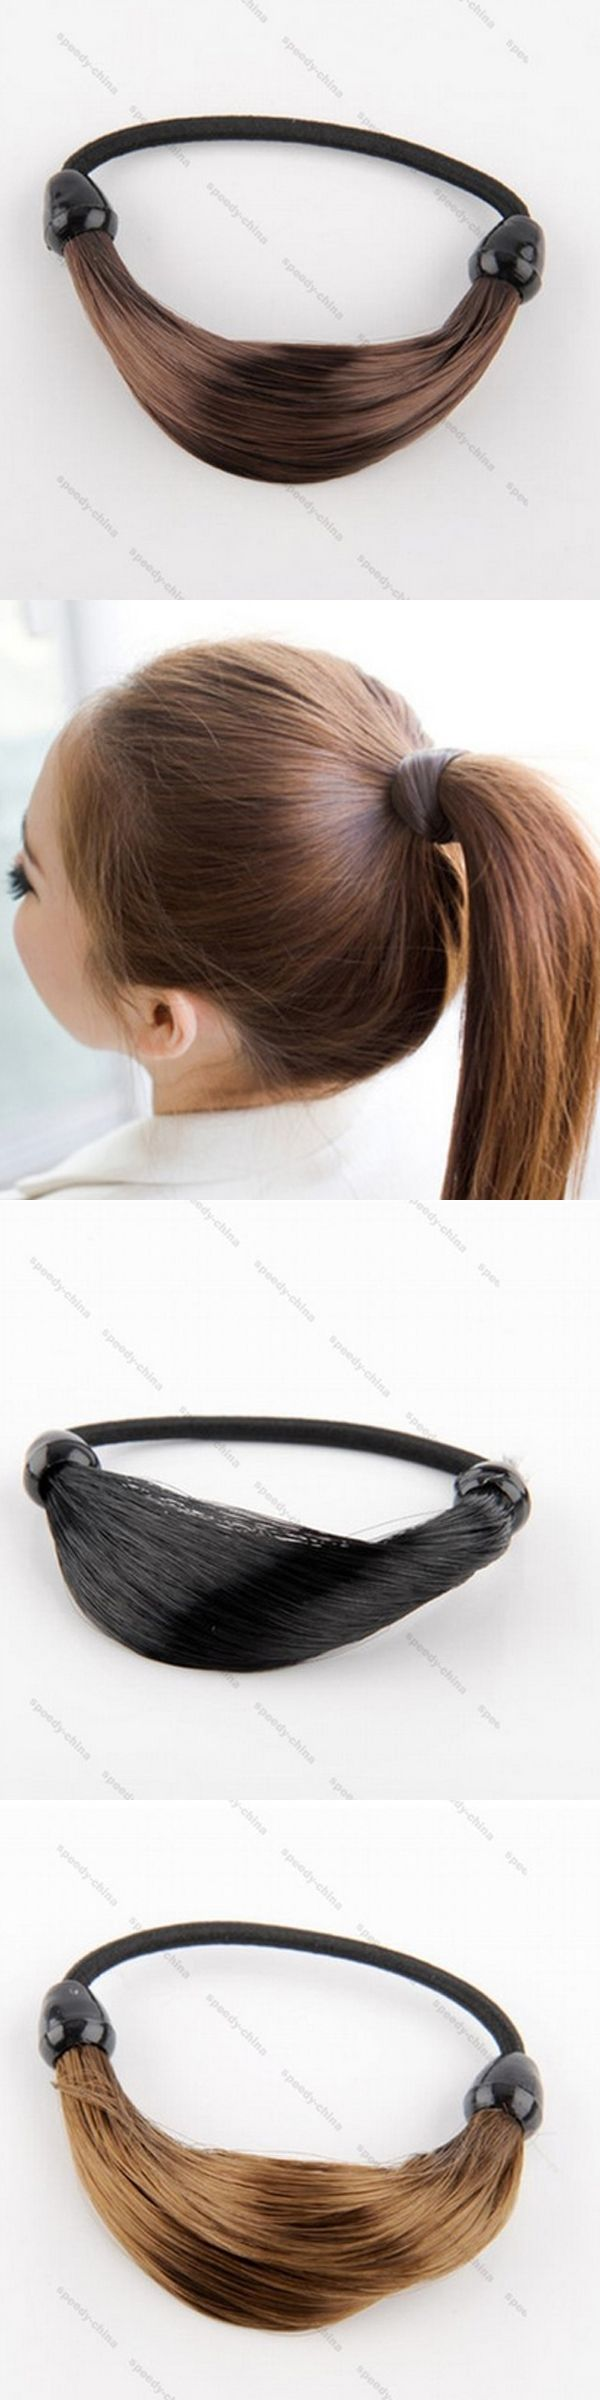 2PCS Simulation Of Wig Ring Hair Rope Ponytail Pigtail Hair Band Headdress 3 Colors Wholesale Hot Hot Item